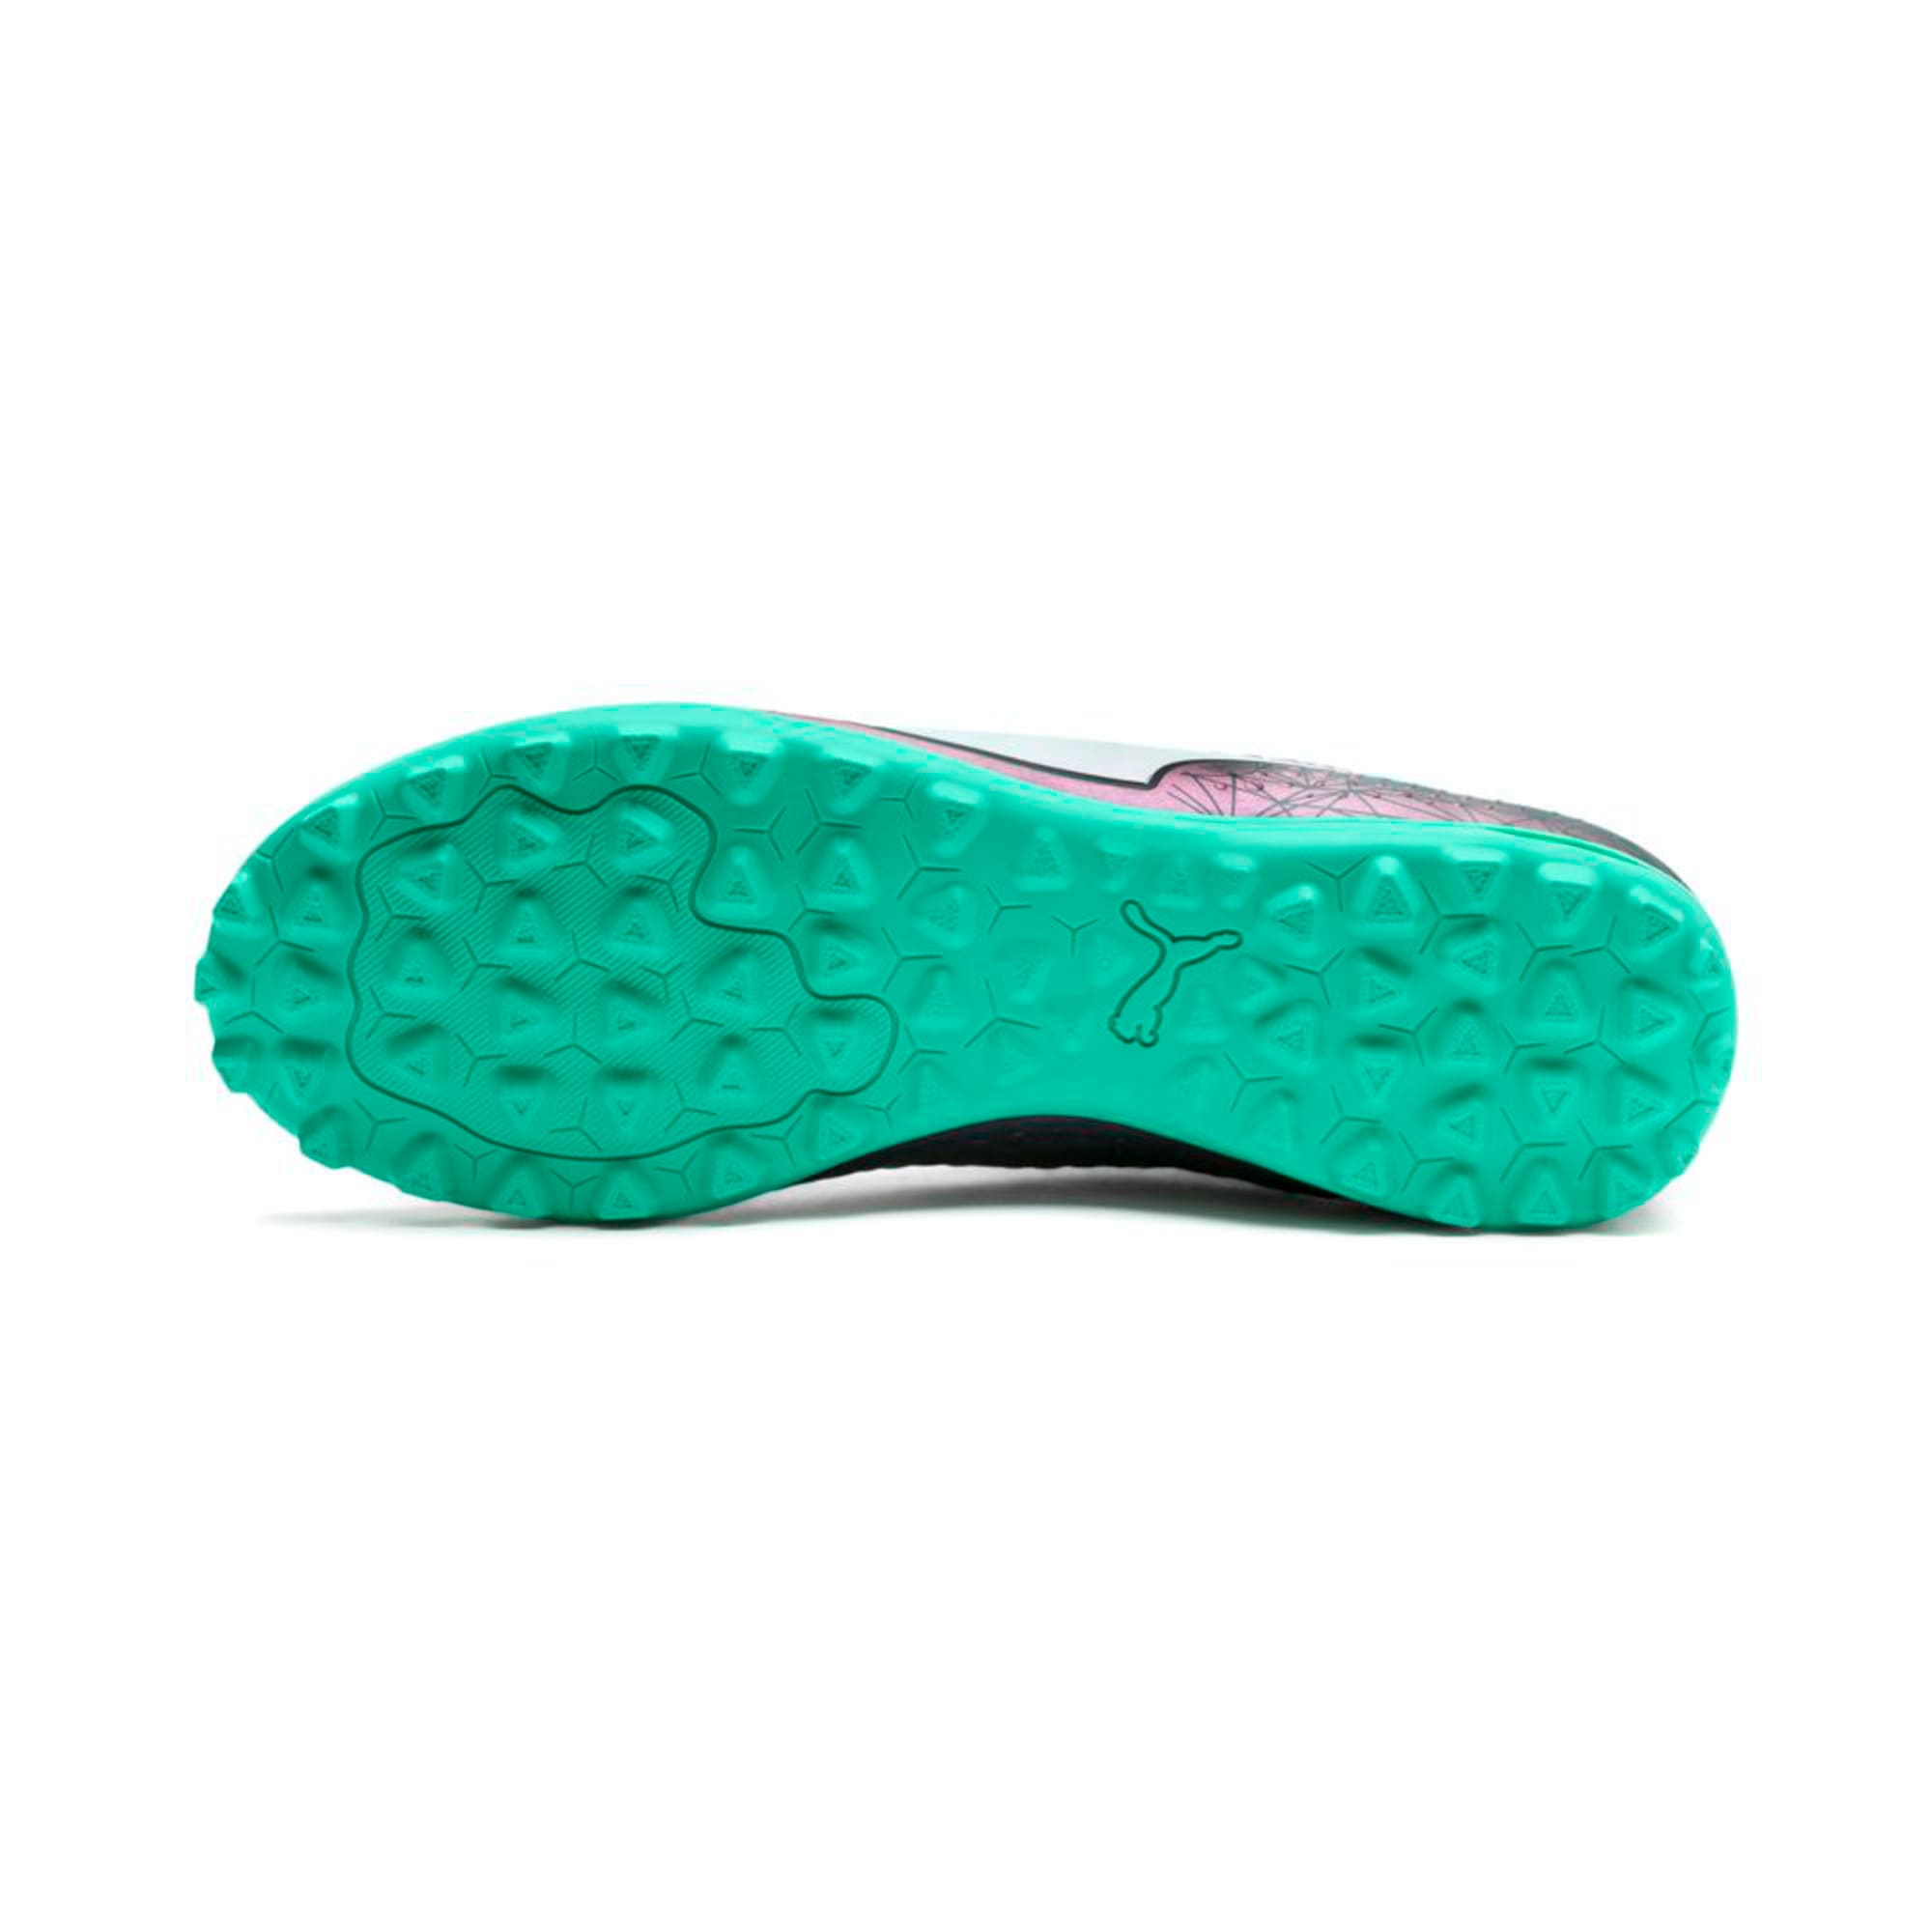 Thumbnail 2 of ONE 4 ILLUMINATE Synthetic TT  Football Boots, Col Shift-Green-White-Black, medium-IND